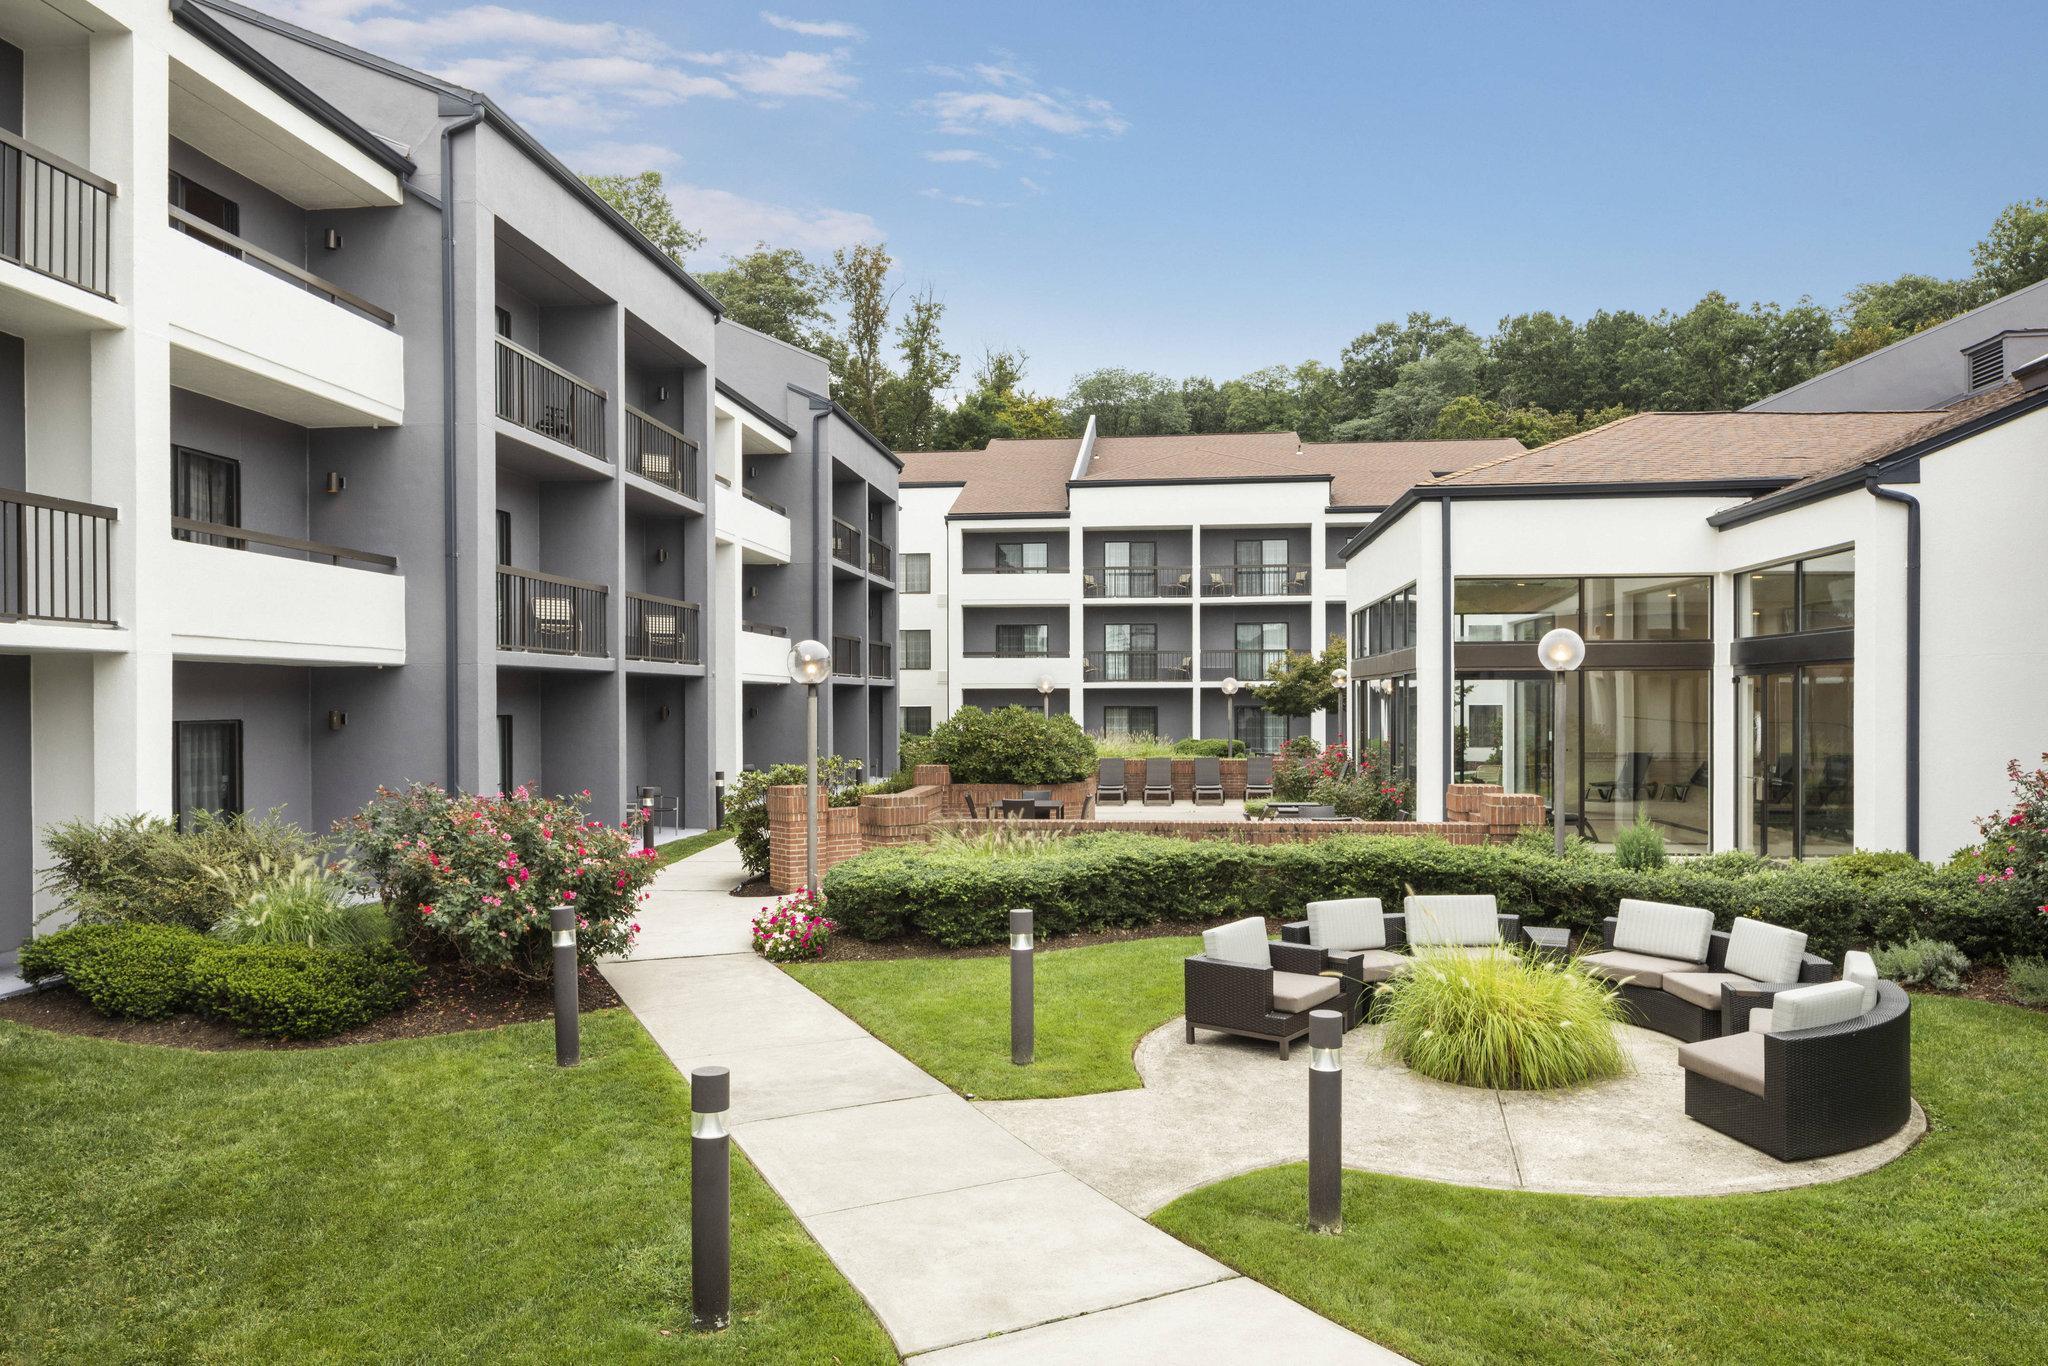 Courtyard Tarrytown Westchester County